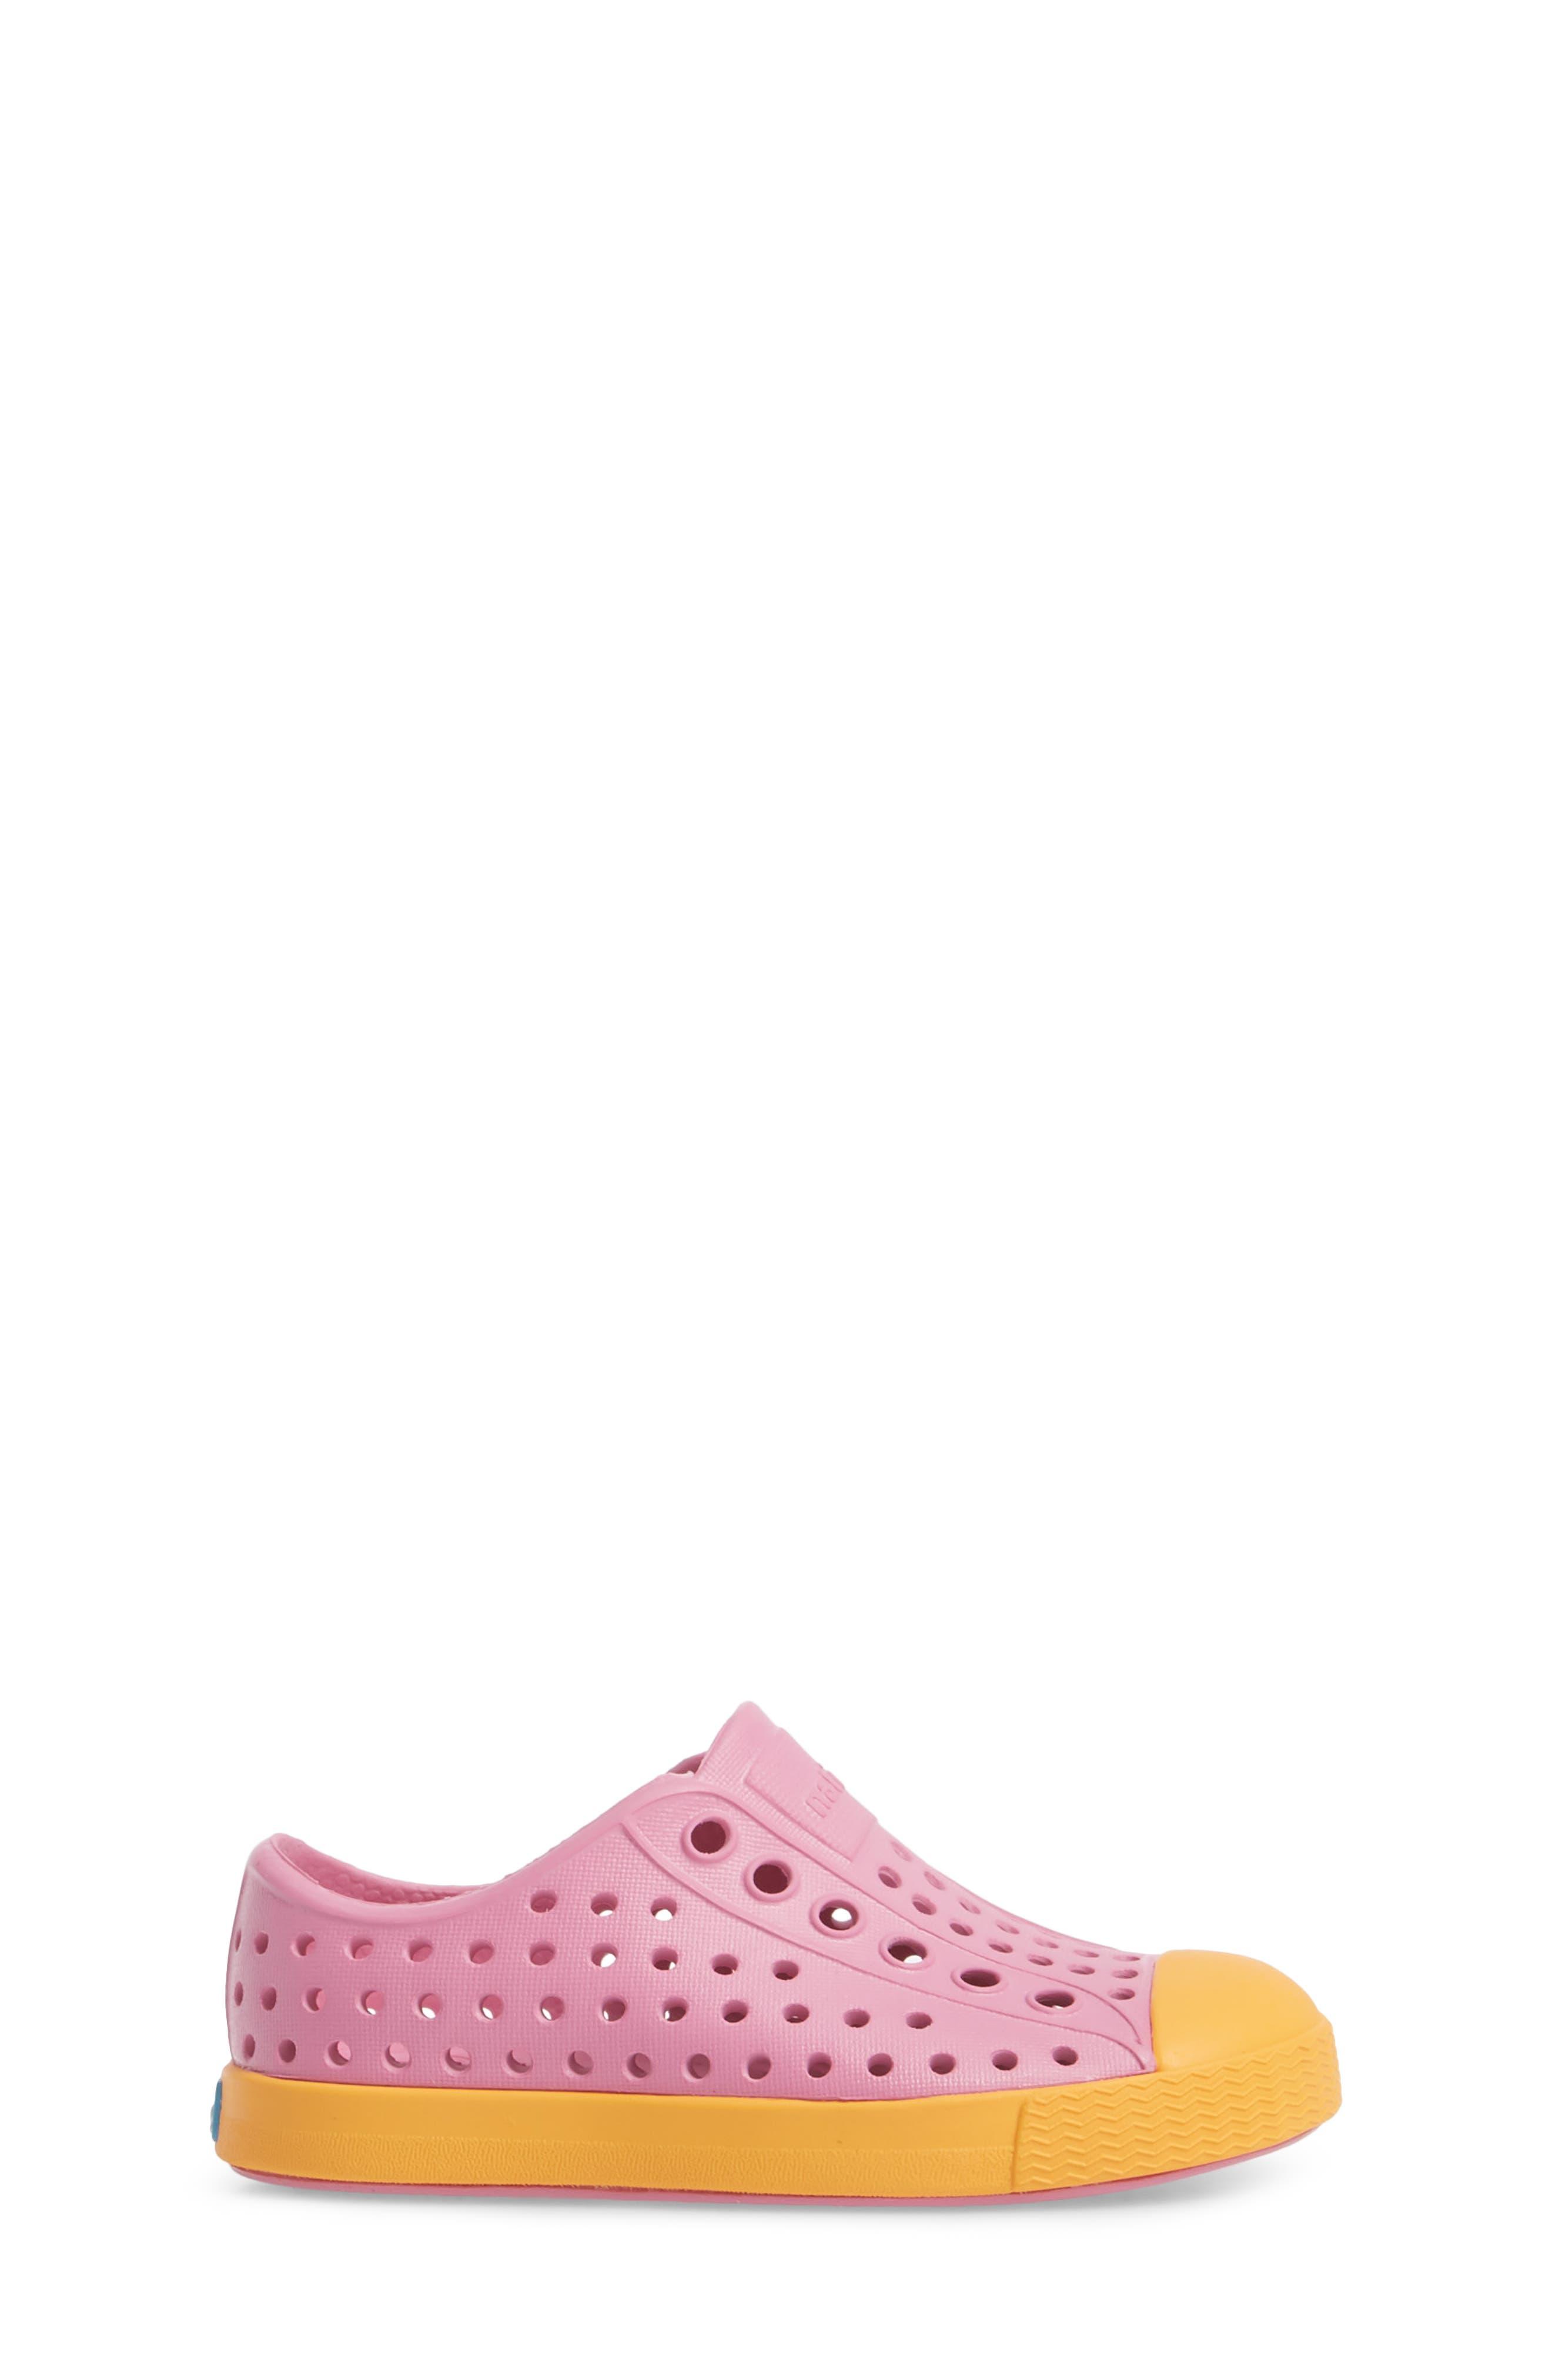 'Jefferson' Water Friendly Slip-On Sneaker,                             Alternate thumbnail 132, color,